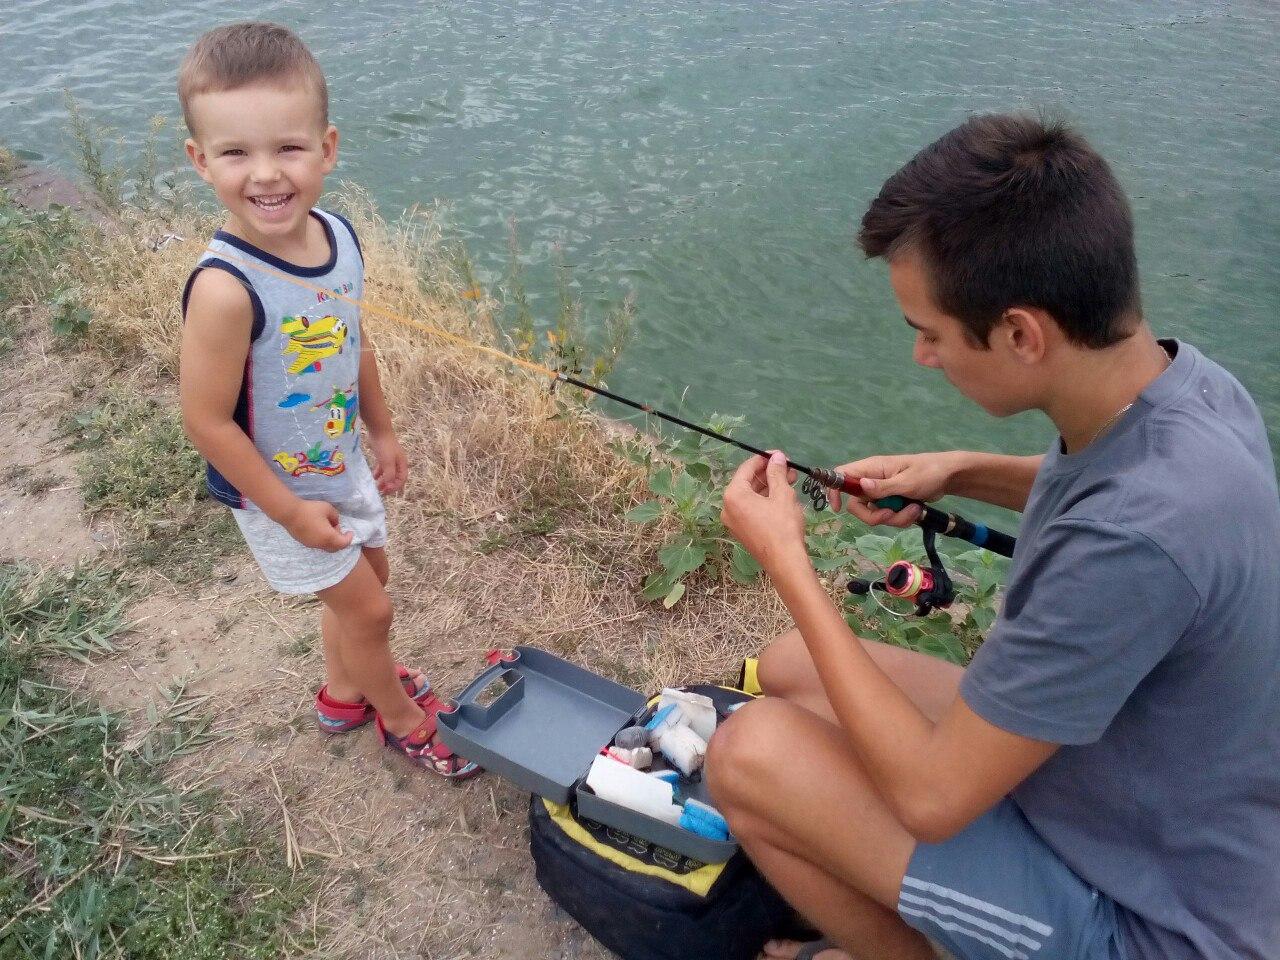 На рыбалочке. Привет из отпуска!